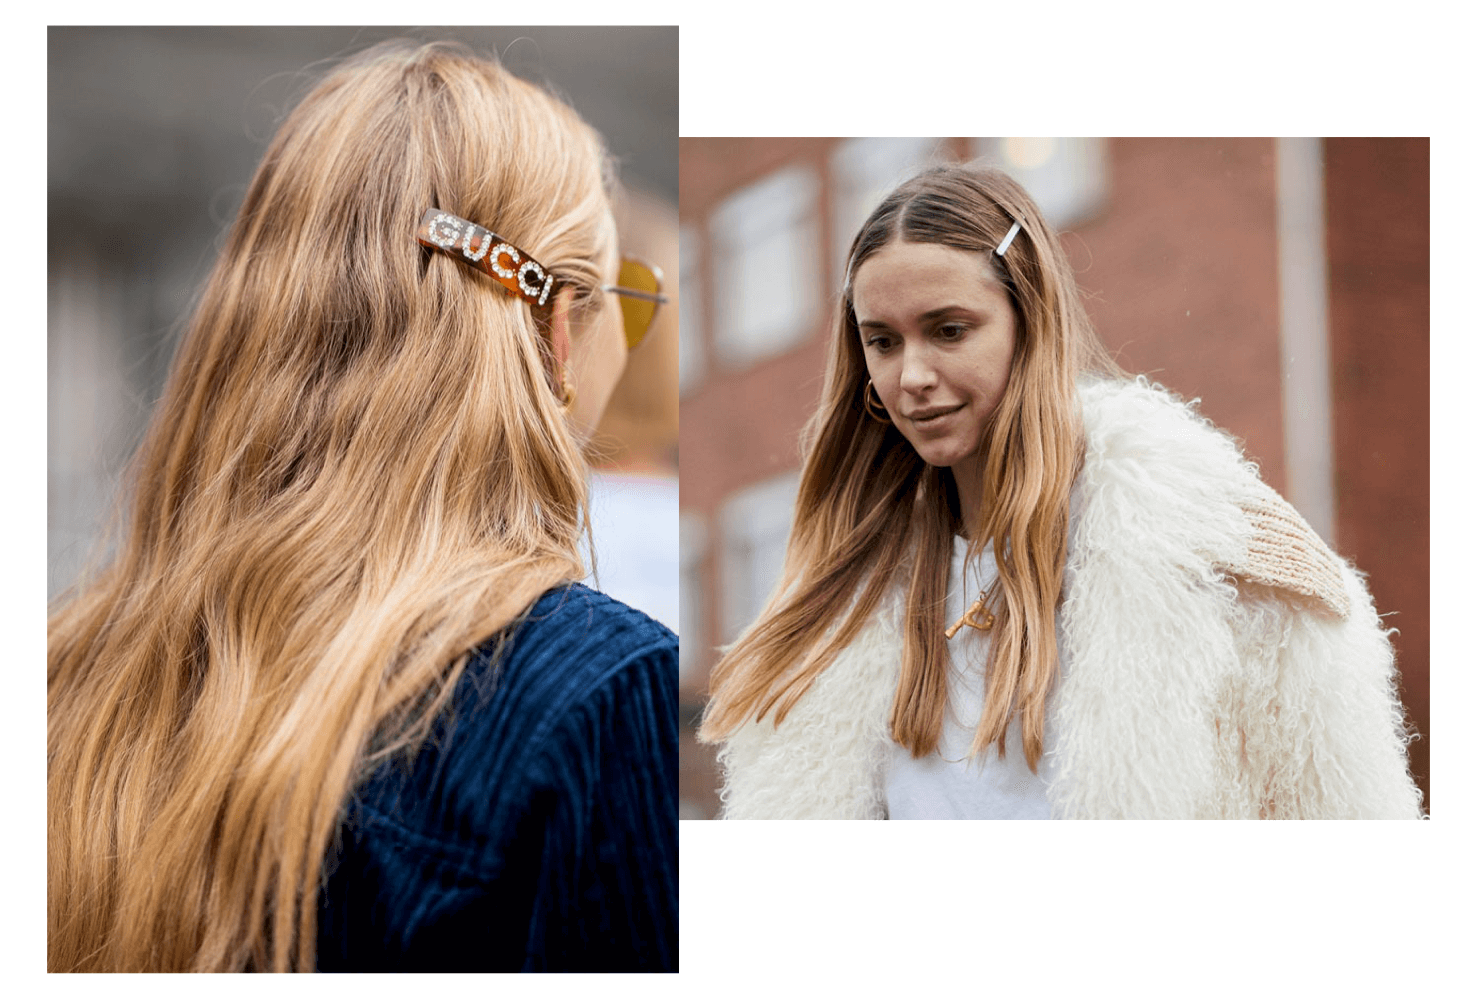 Peinados con horquillas - Tendencia street style .